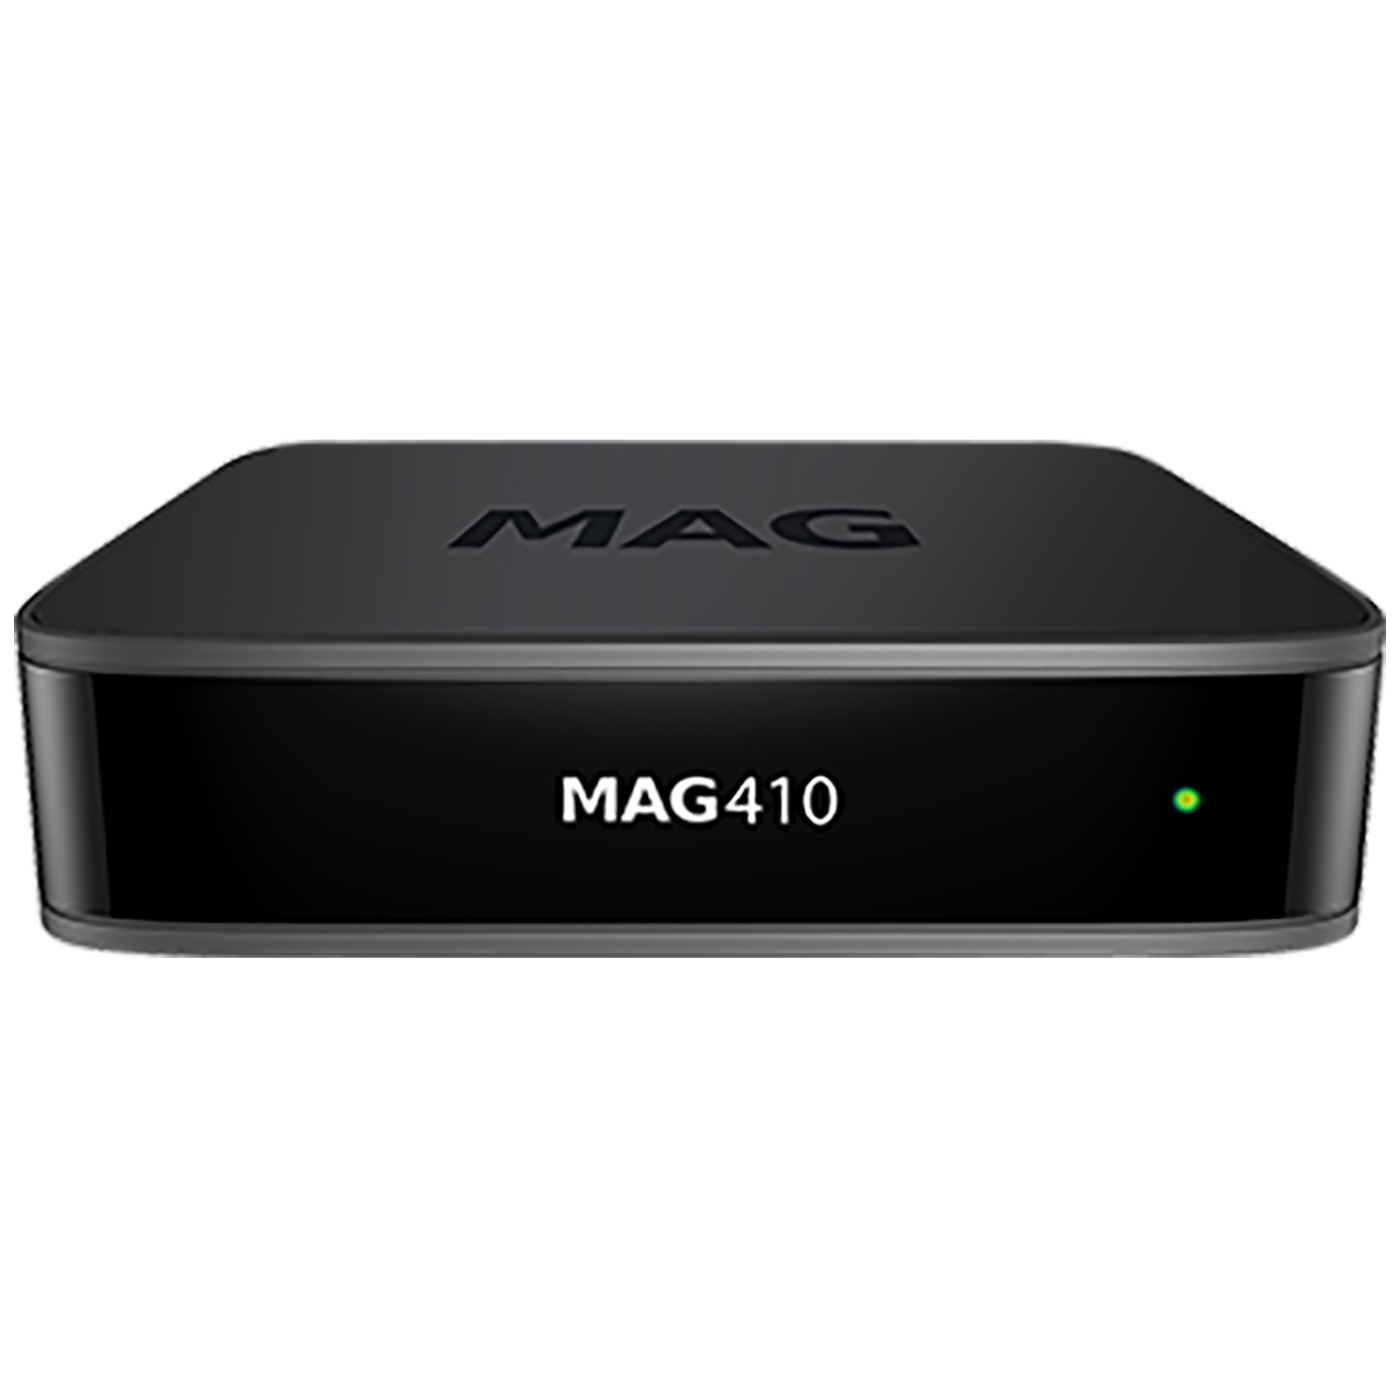 MAG 410